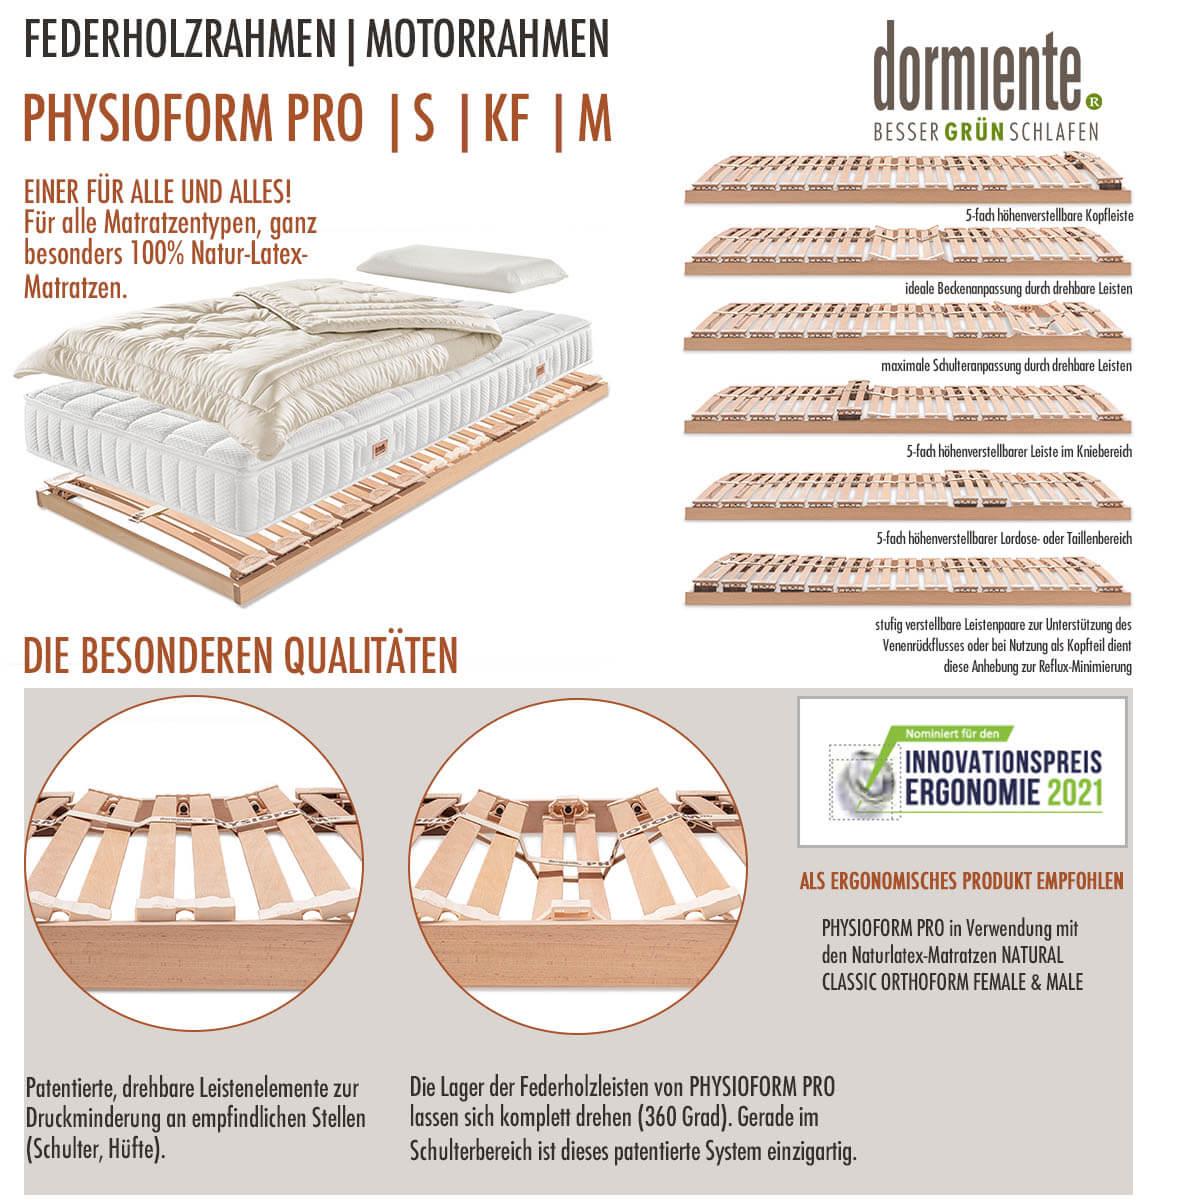 Dormiente-Physioform-Pro-Federholzrahmen-und-Motorrahmen